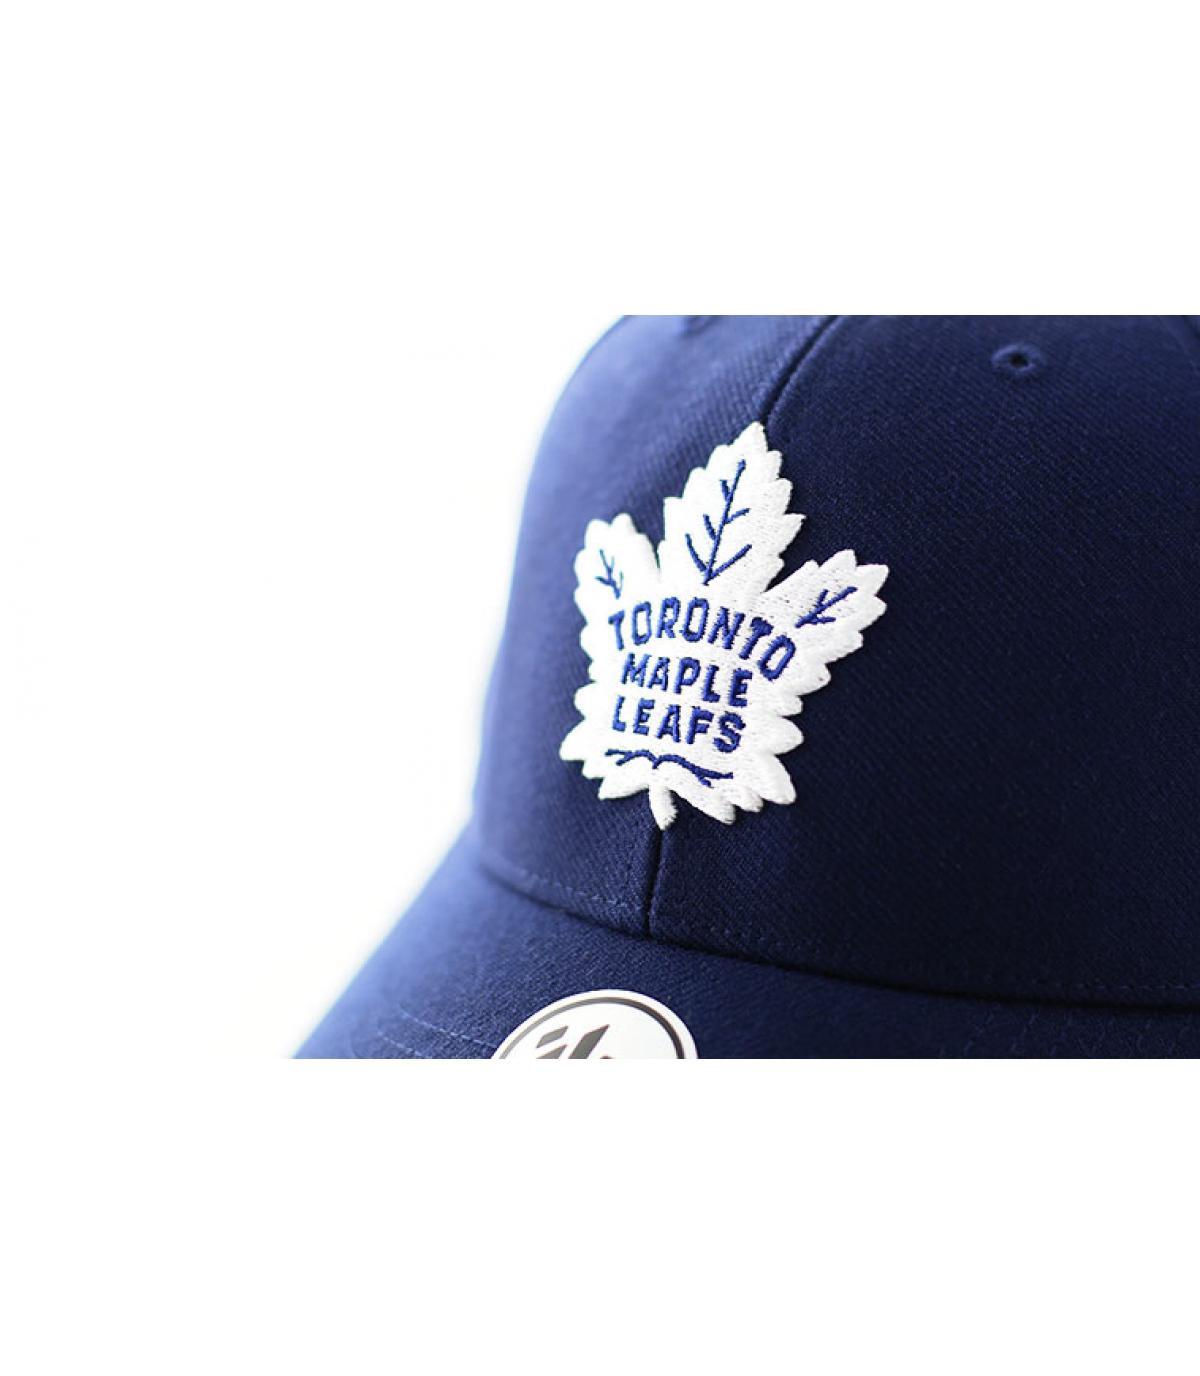 Détails MVP Toronto Maple Leafs light navy - image 3